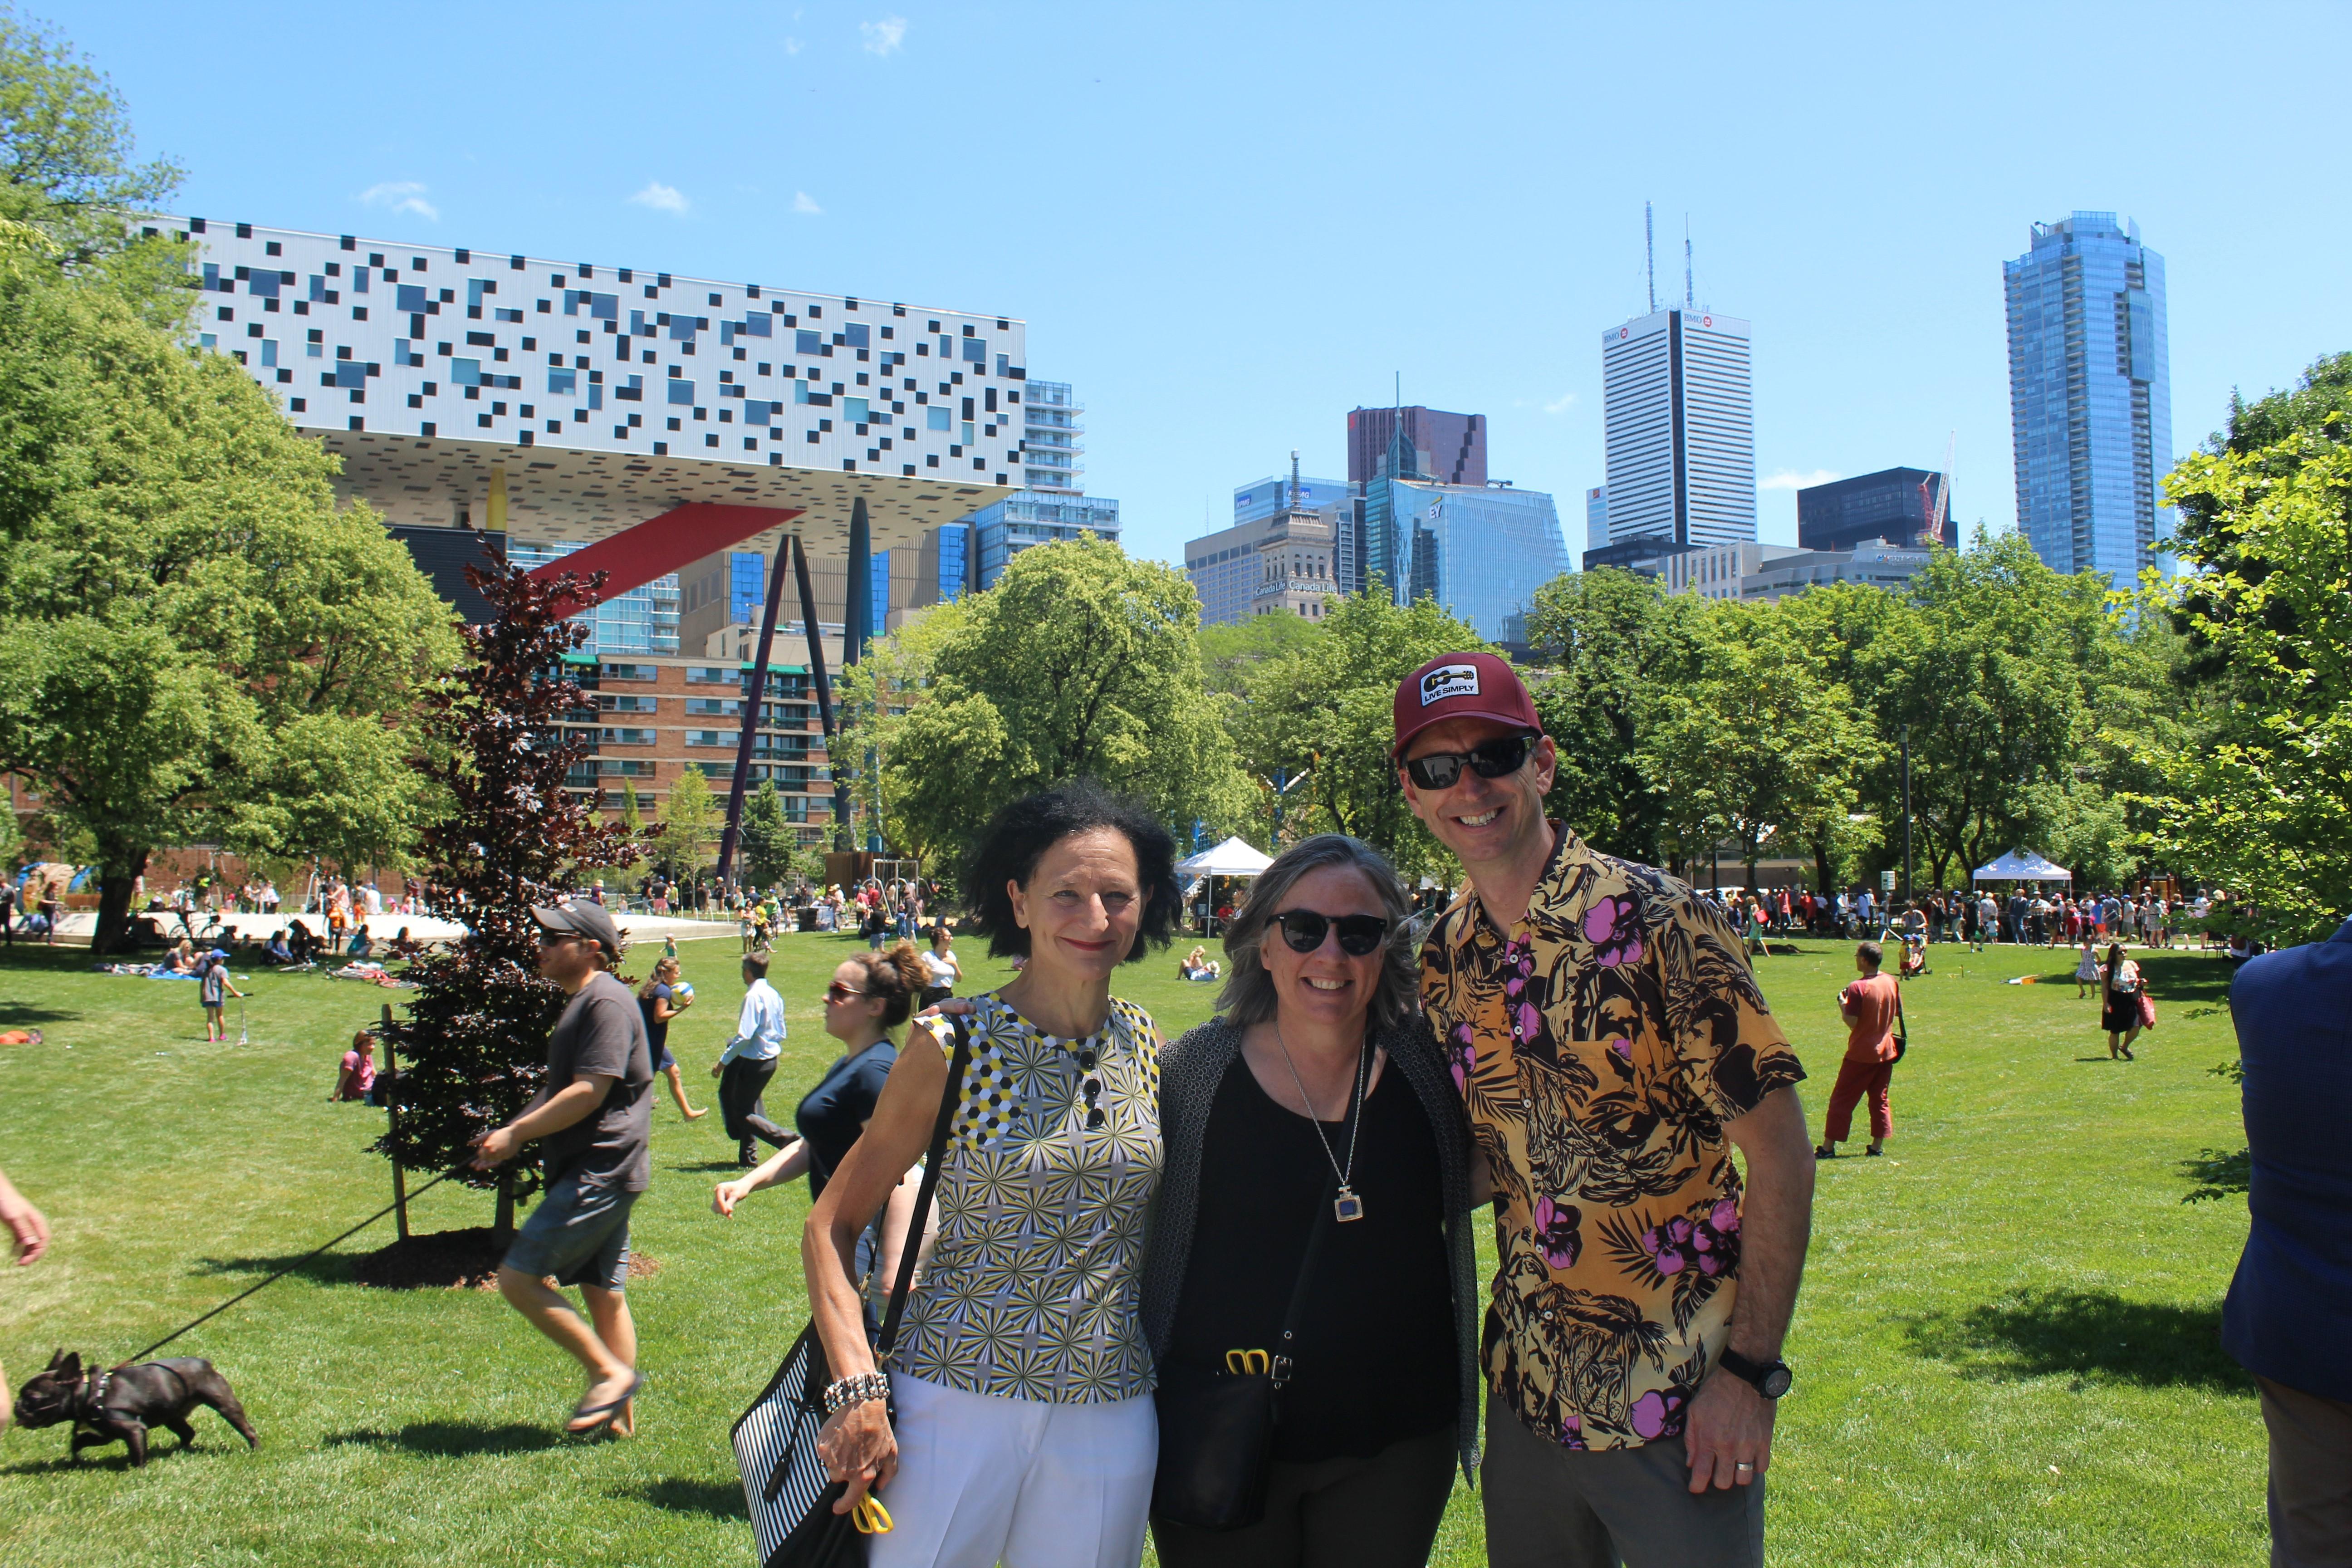 Sara Diamond, Gillian Siddall and Robert Luke in Grange Park with Sharp Centre in the background, photo Adam Wiendels